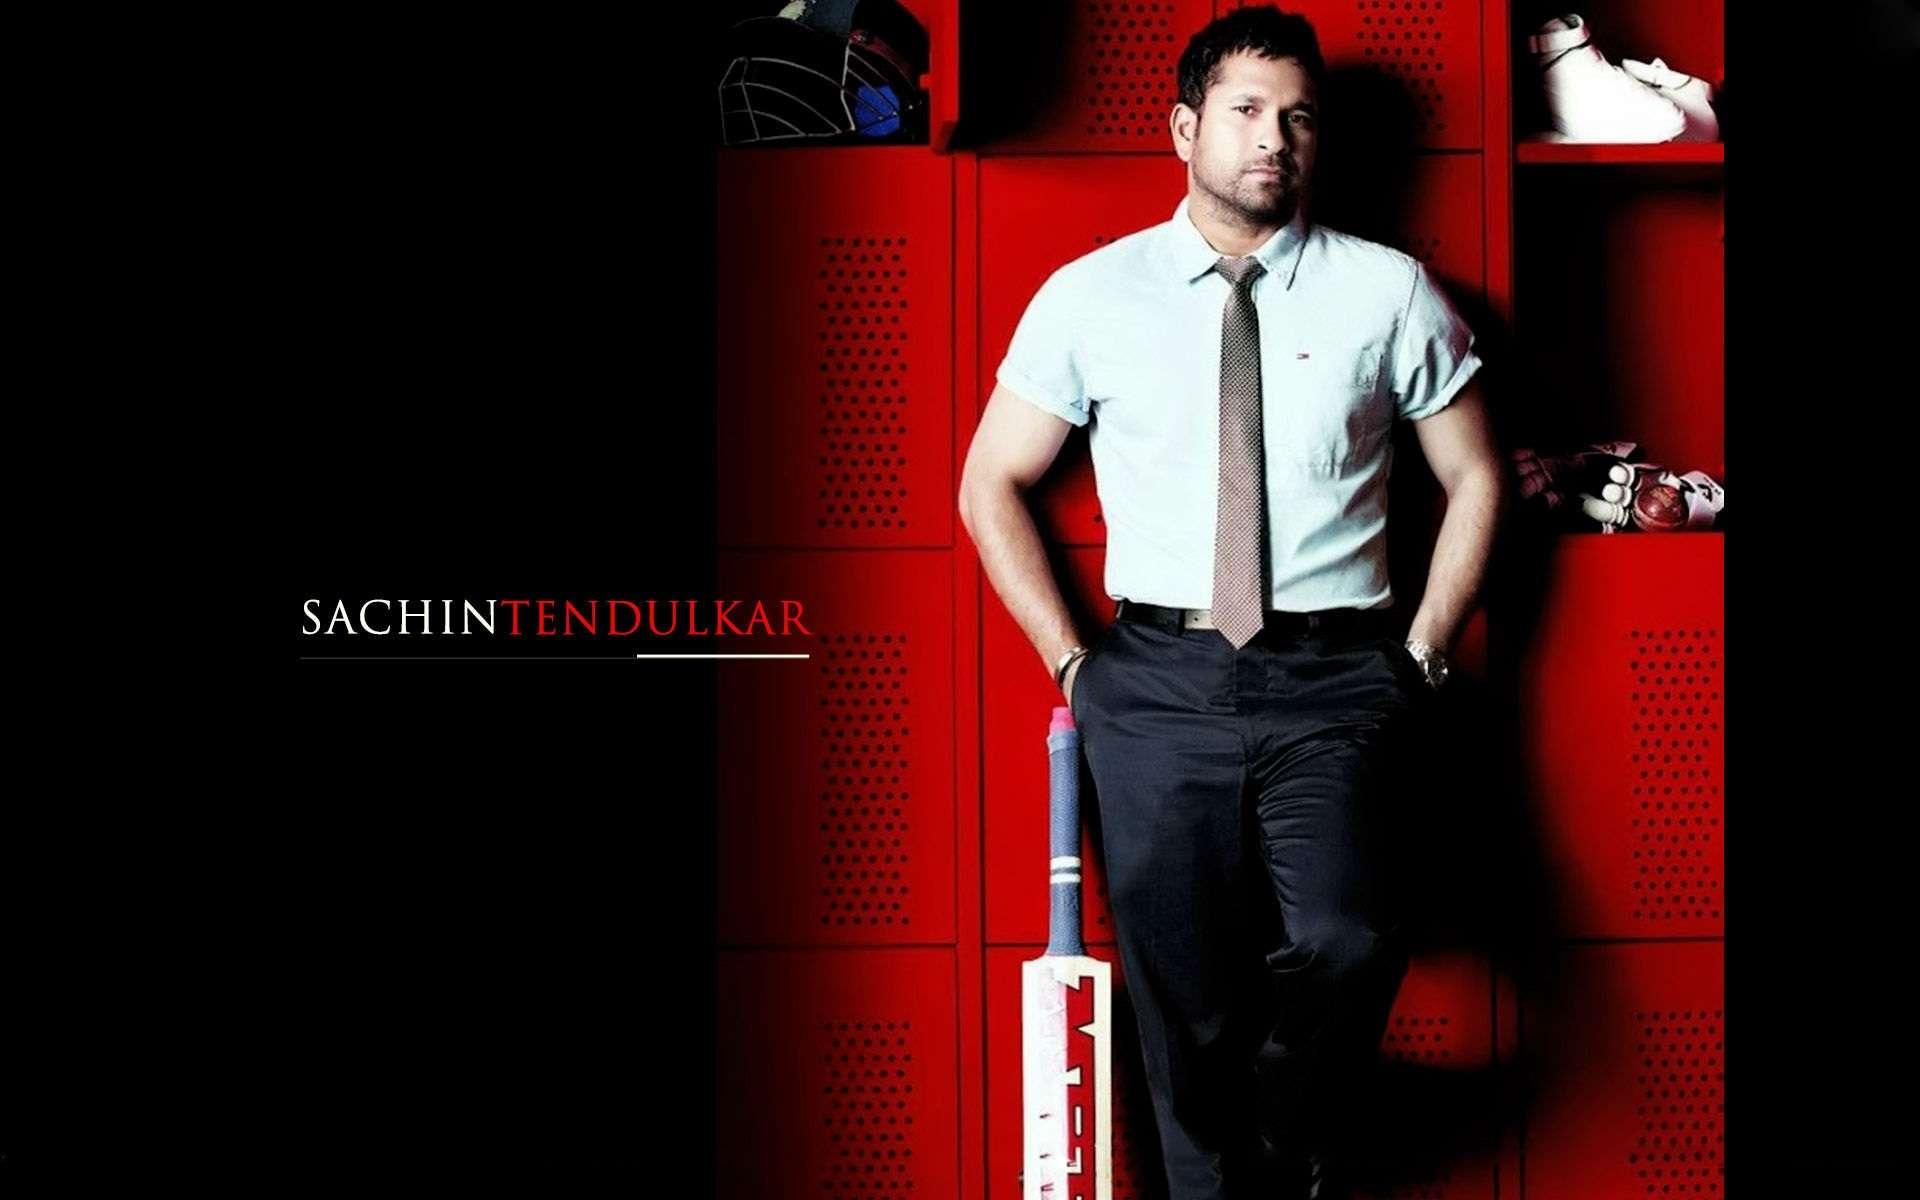 45th birthday of Indian cricket legend Sachin Tendulkar